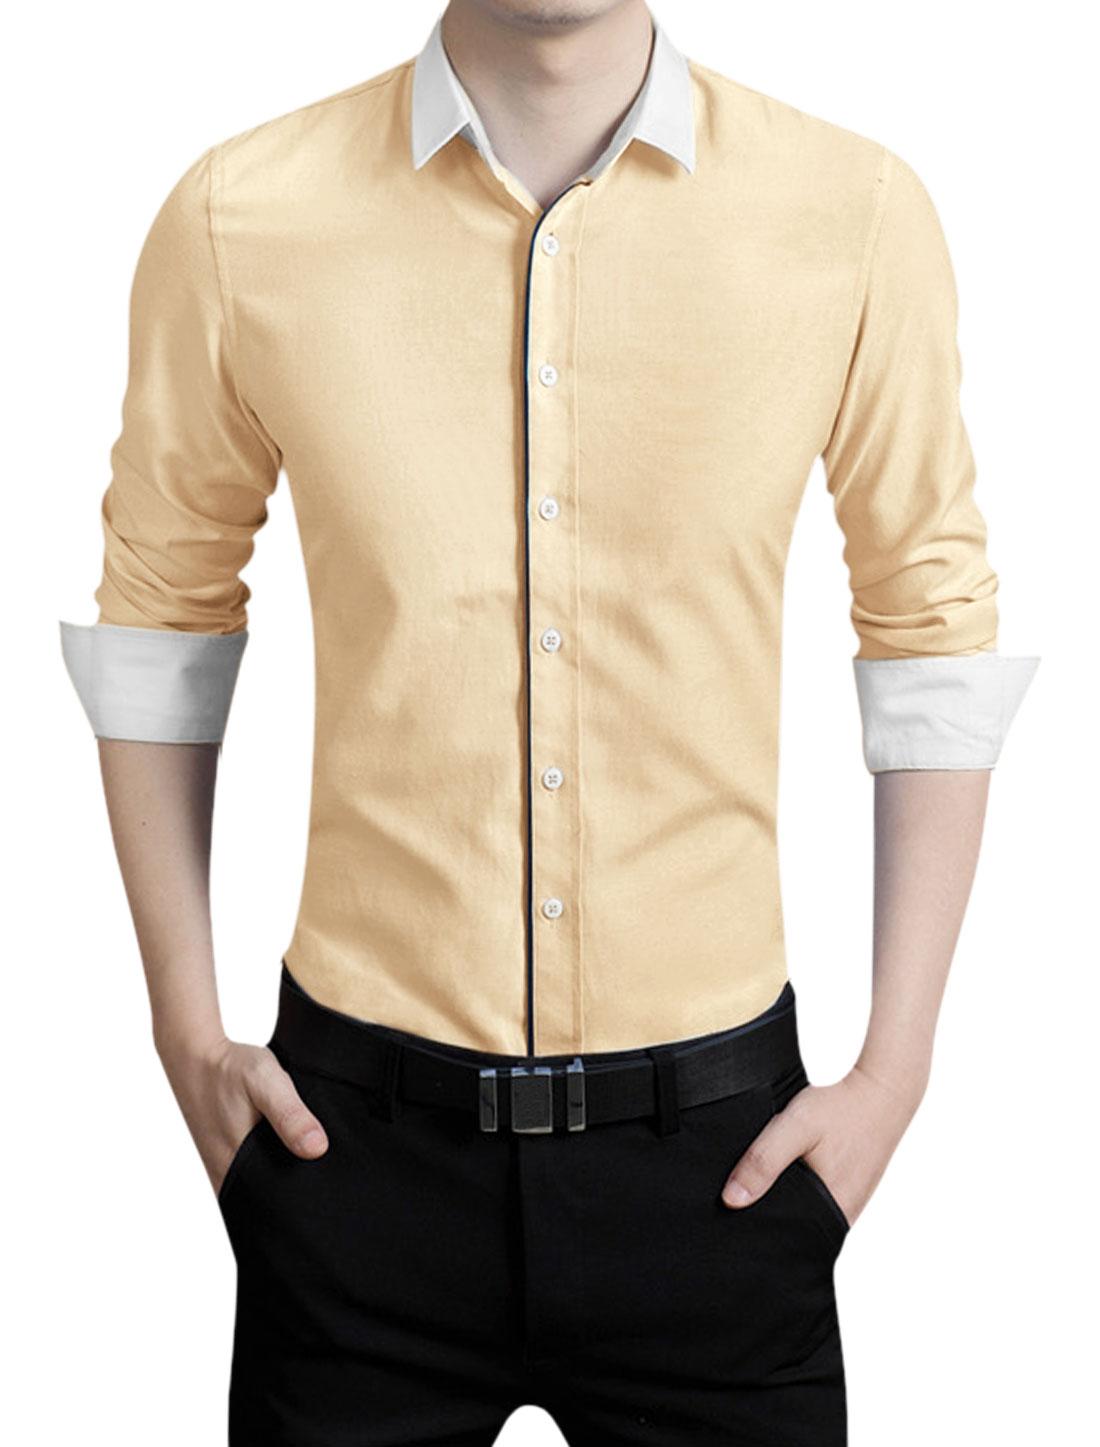 Men Point Collar Slim Fit Lightweight Casual Long Sleeves Shirt Yellow M